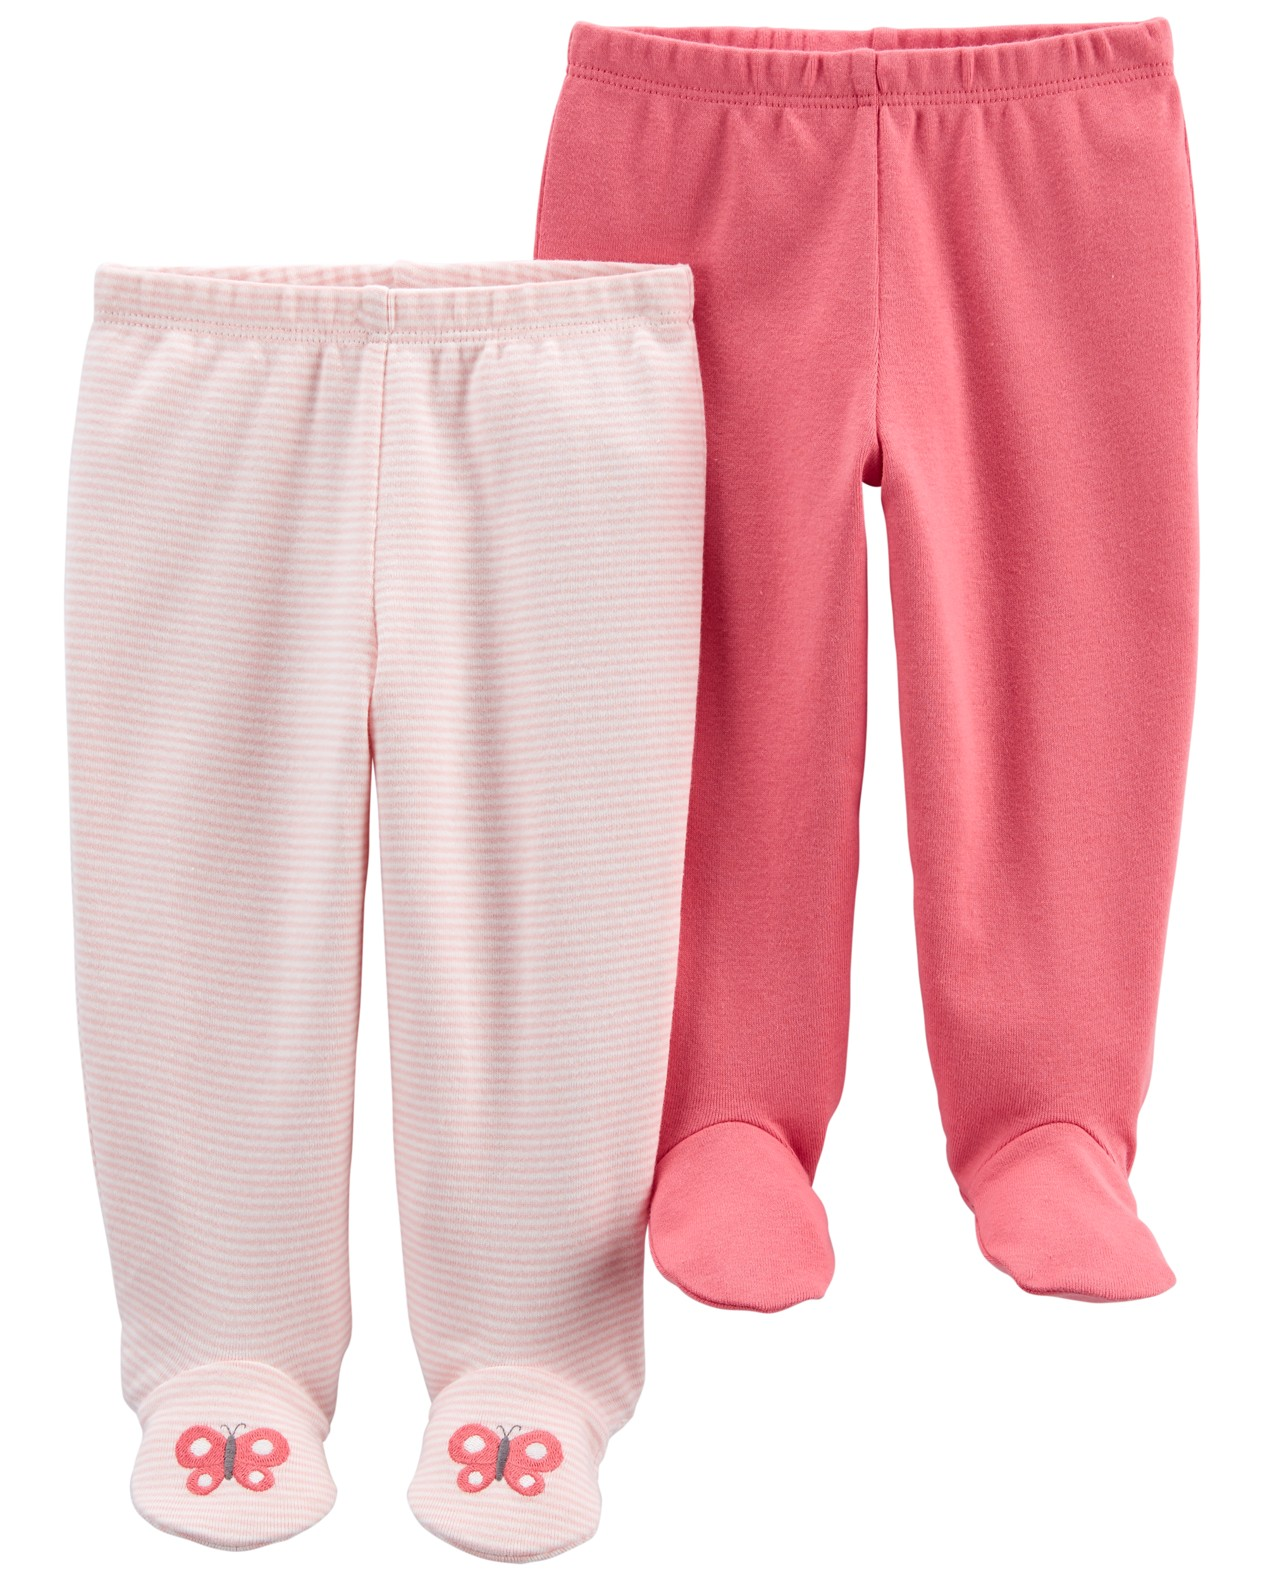 CARTER'S Polodupačky Pink dievča LBB 2ks NB, veľ. 56